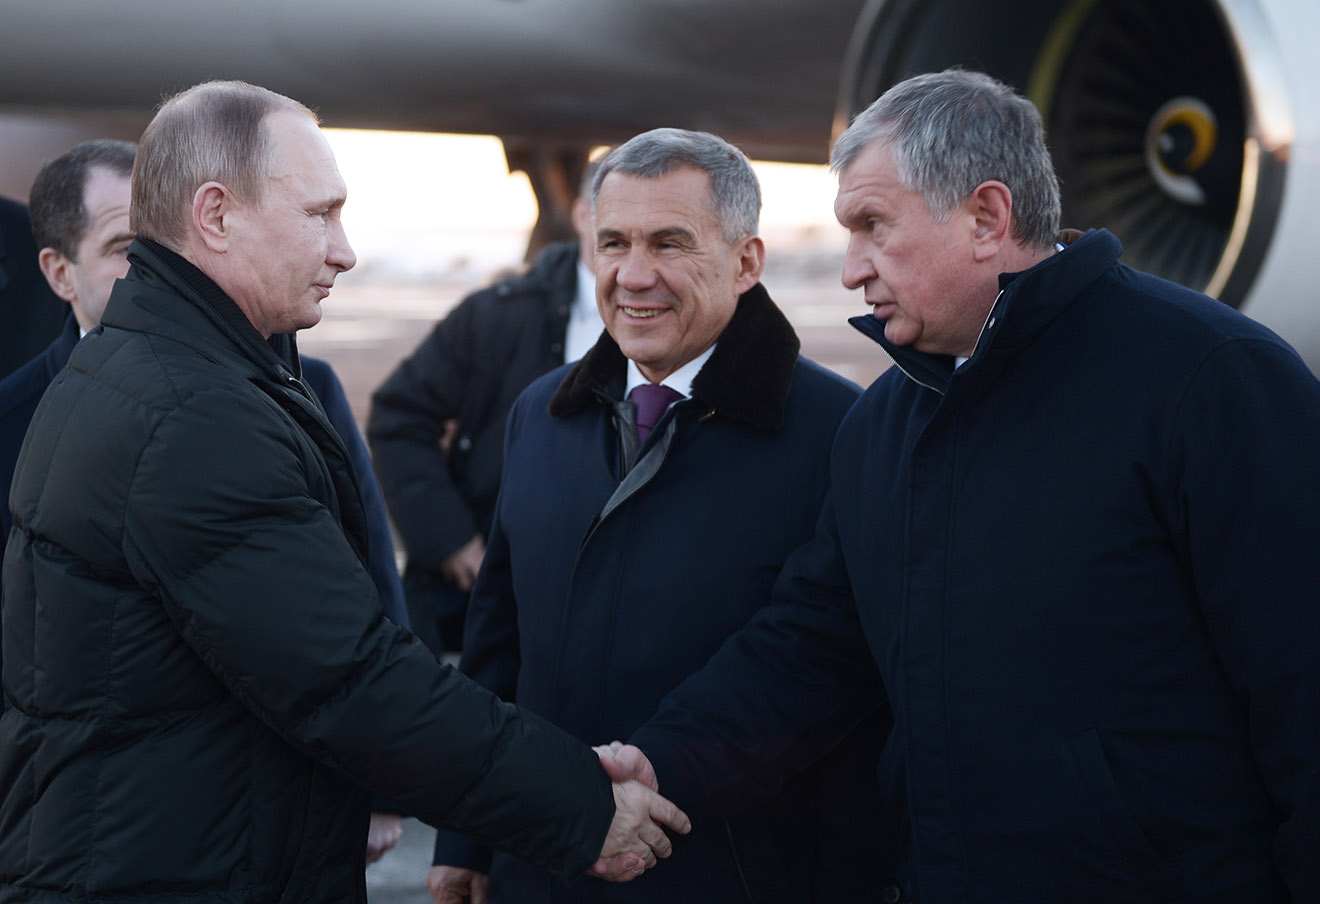 Владимир Путин и Игорь Сечин (справа).